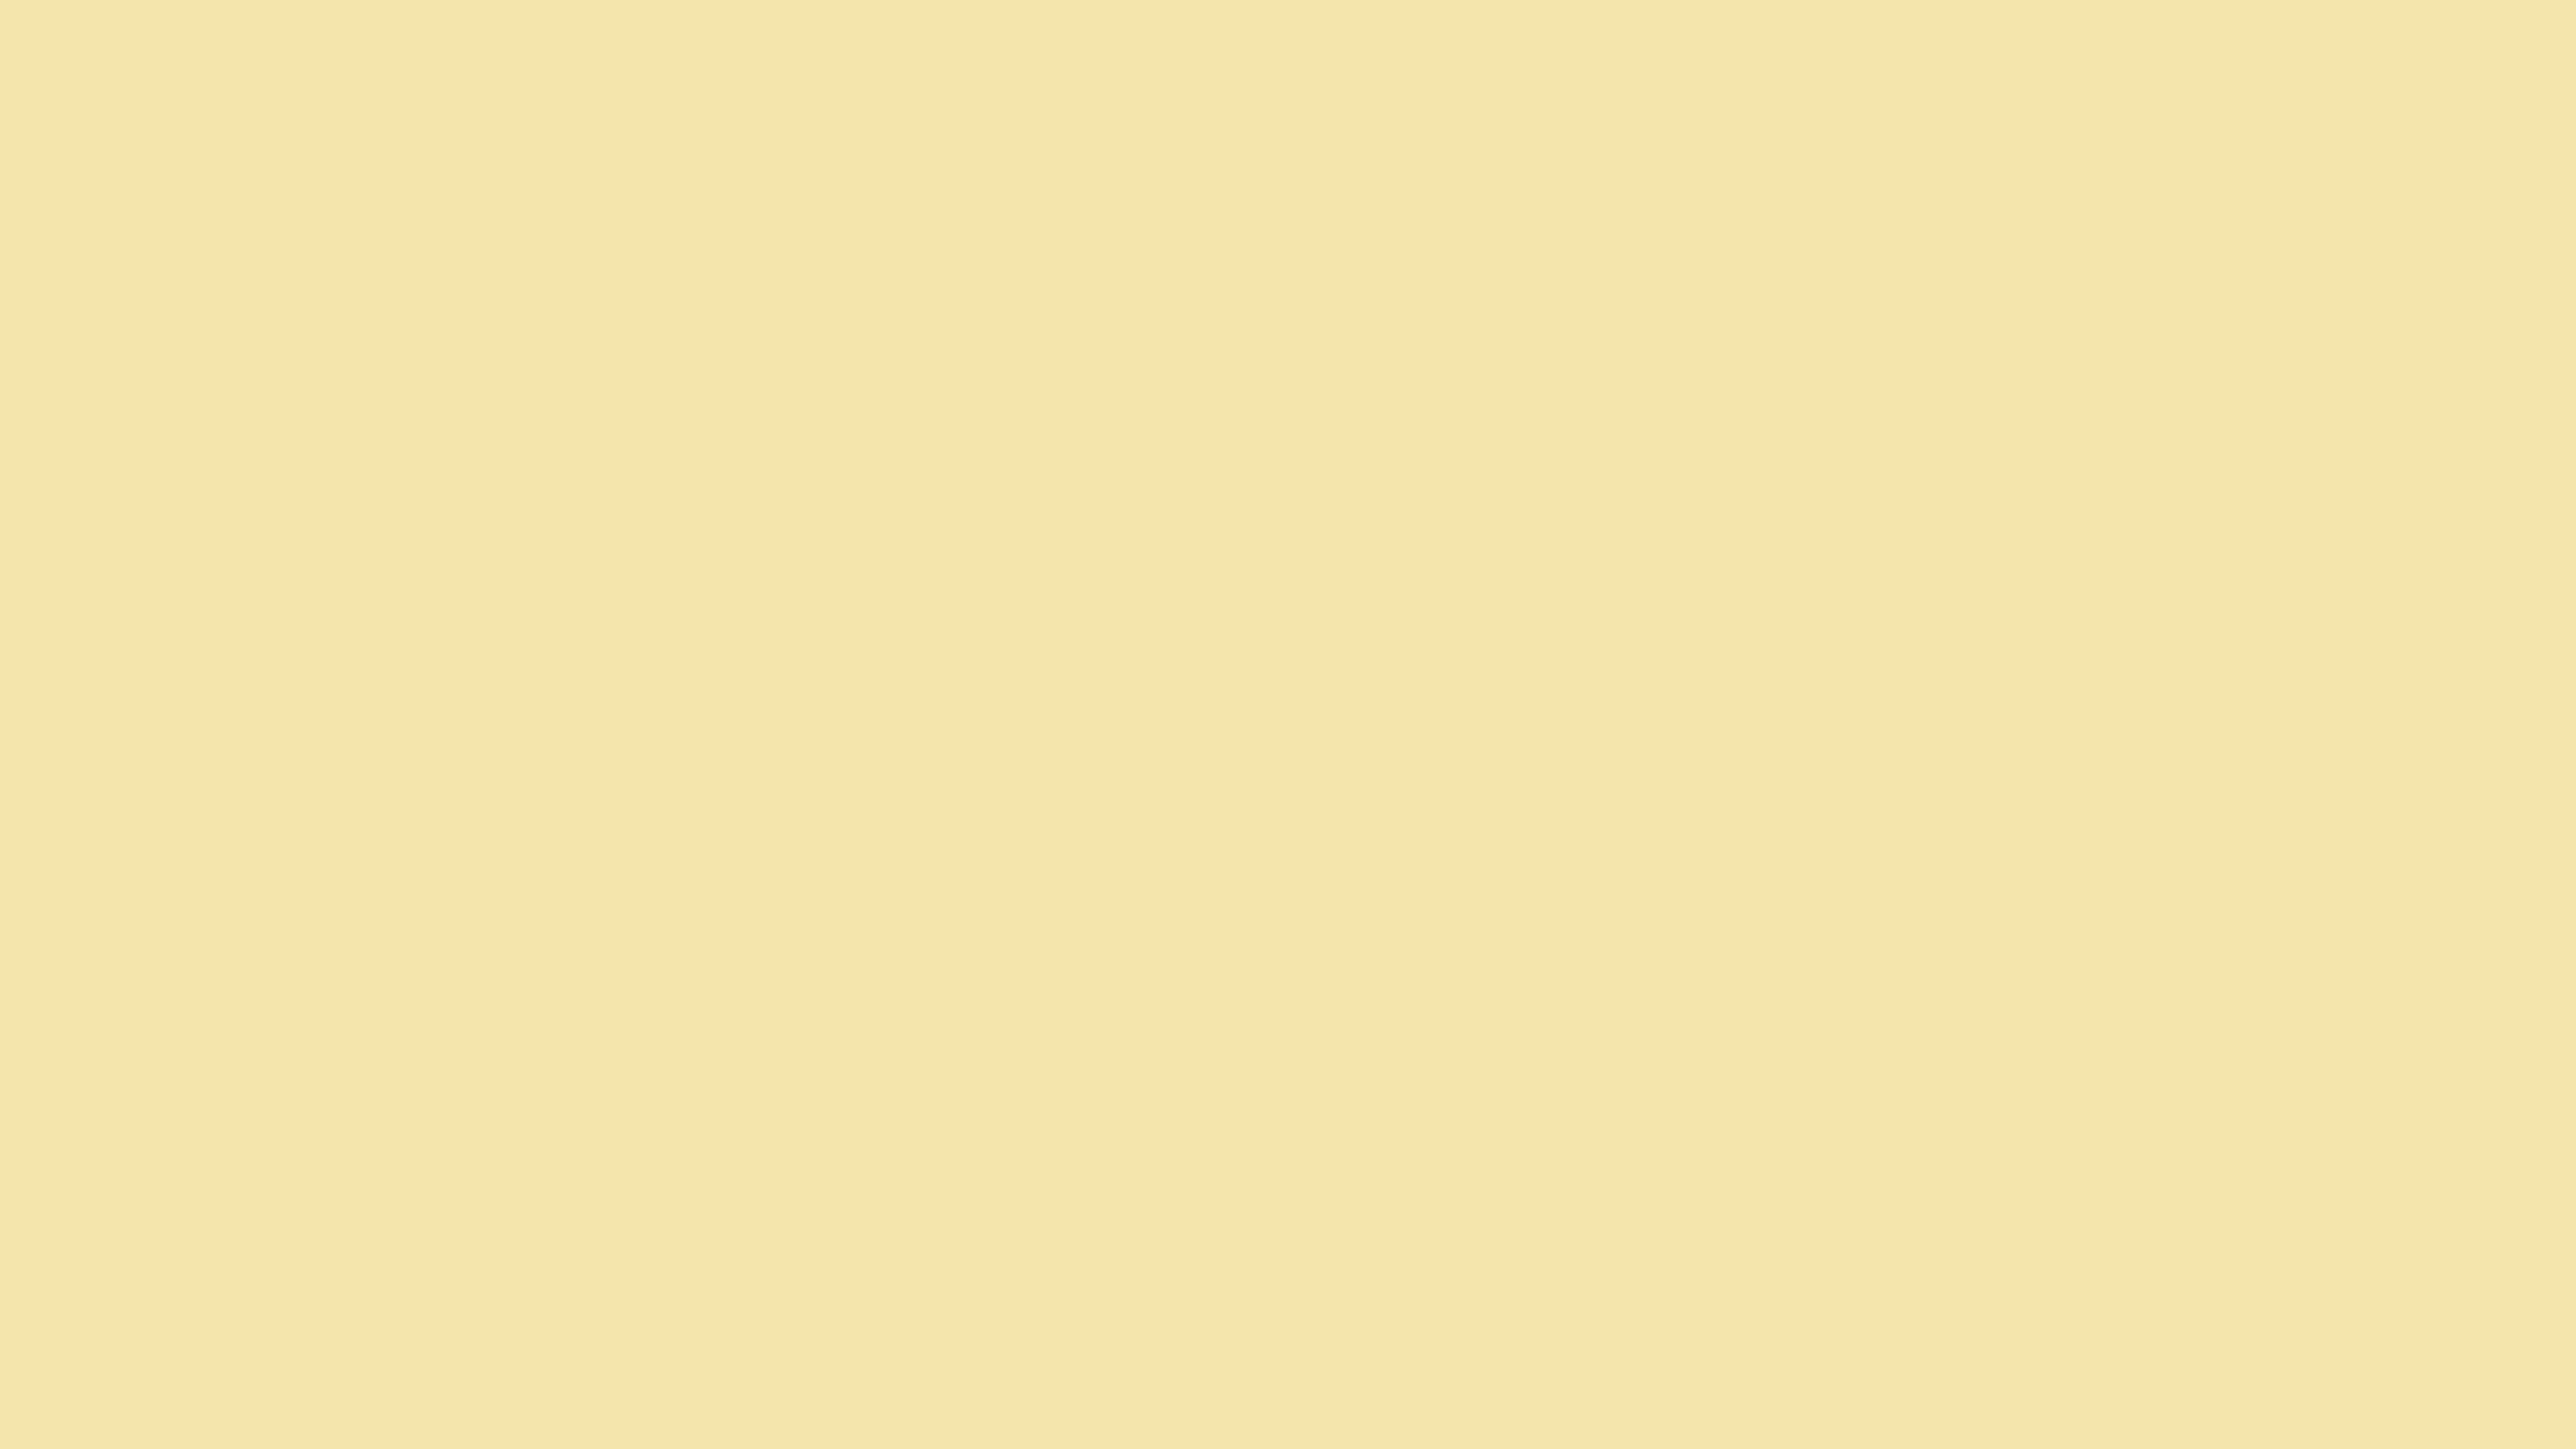 Vanilla Solid Color Background Wallpaper [5120x2880]